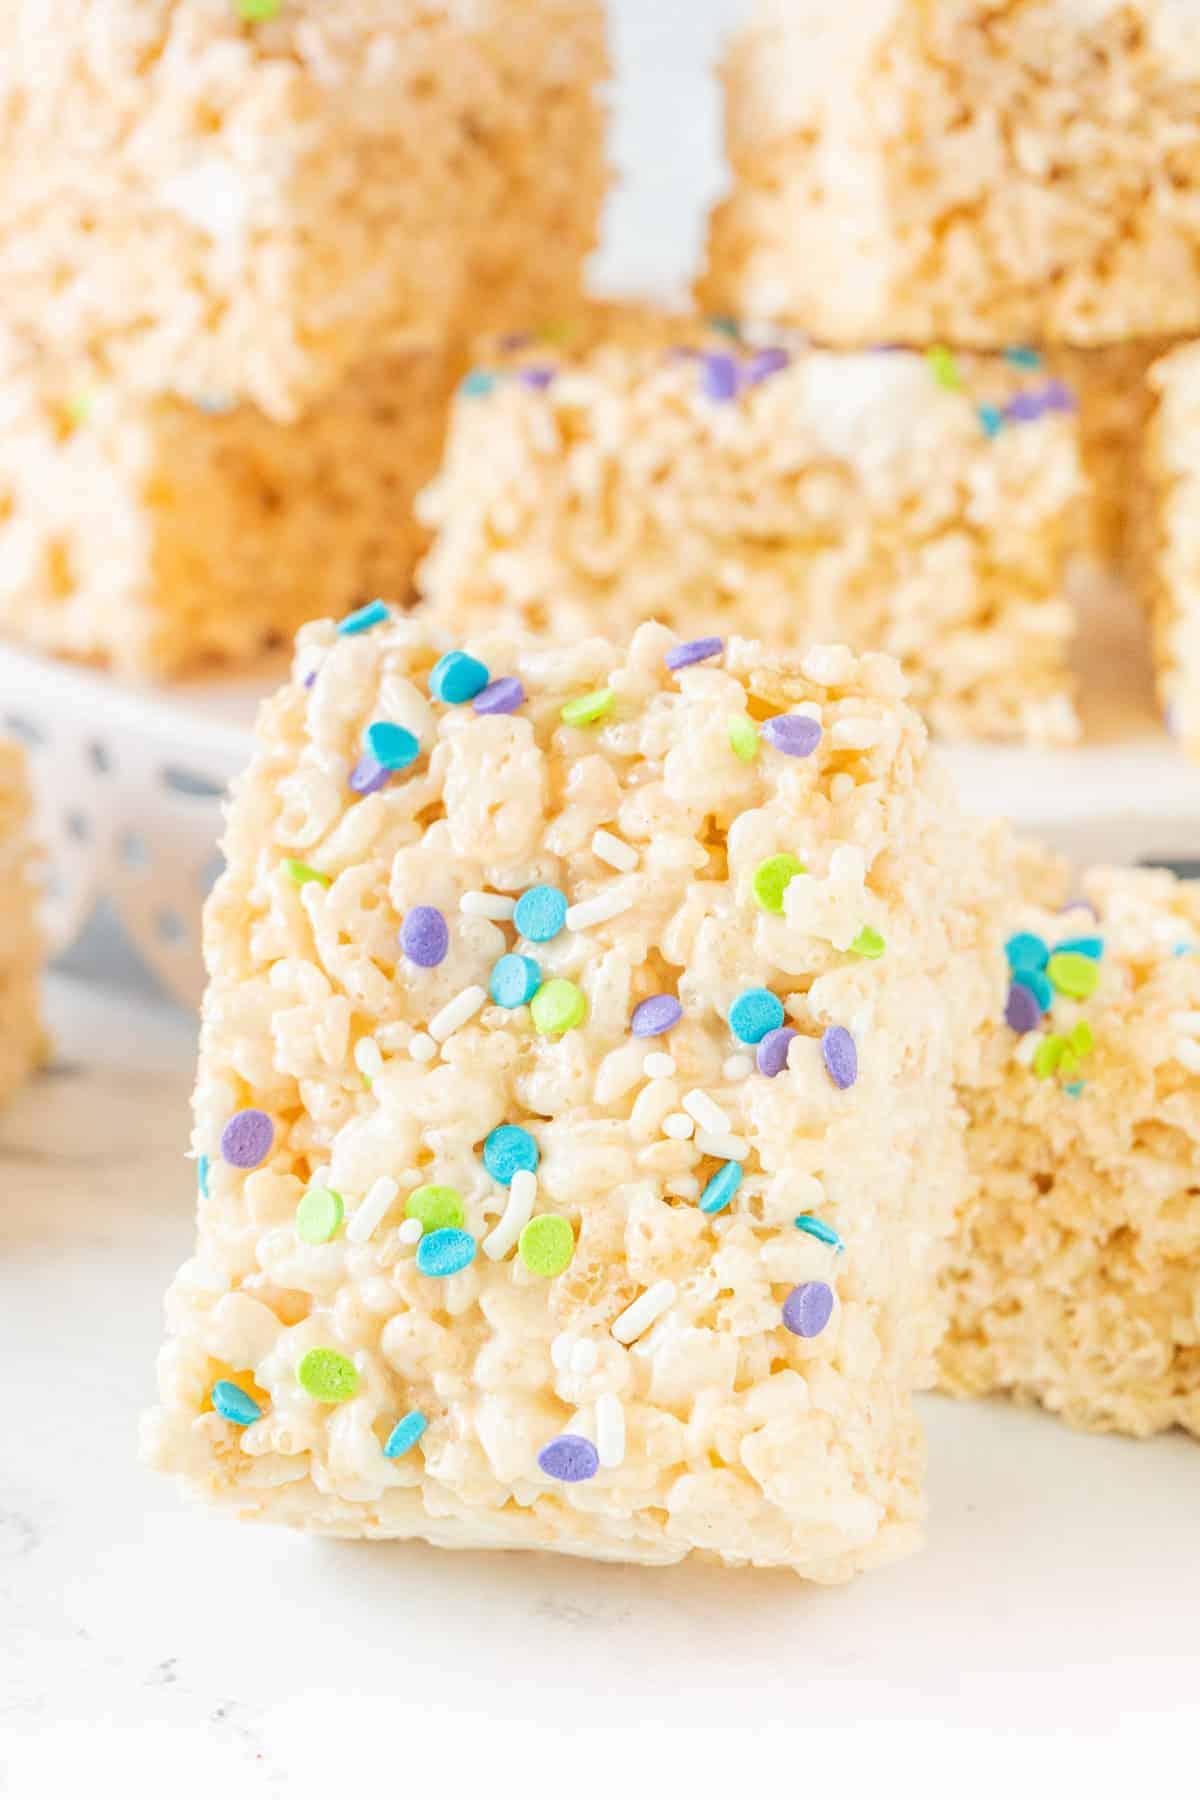 Rice Crispy Treat leaning against other rice crispy treats